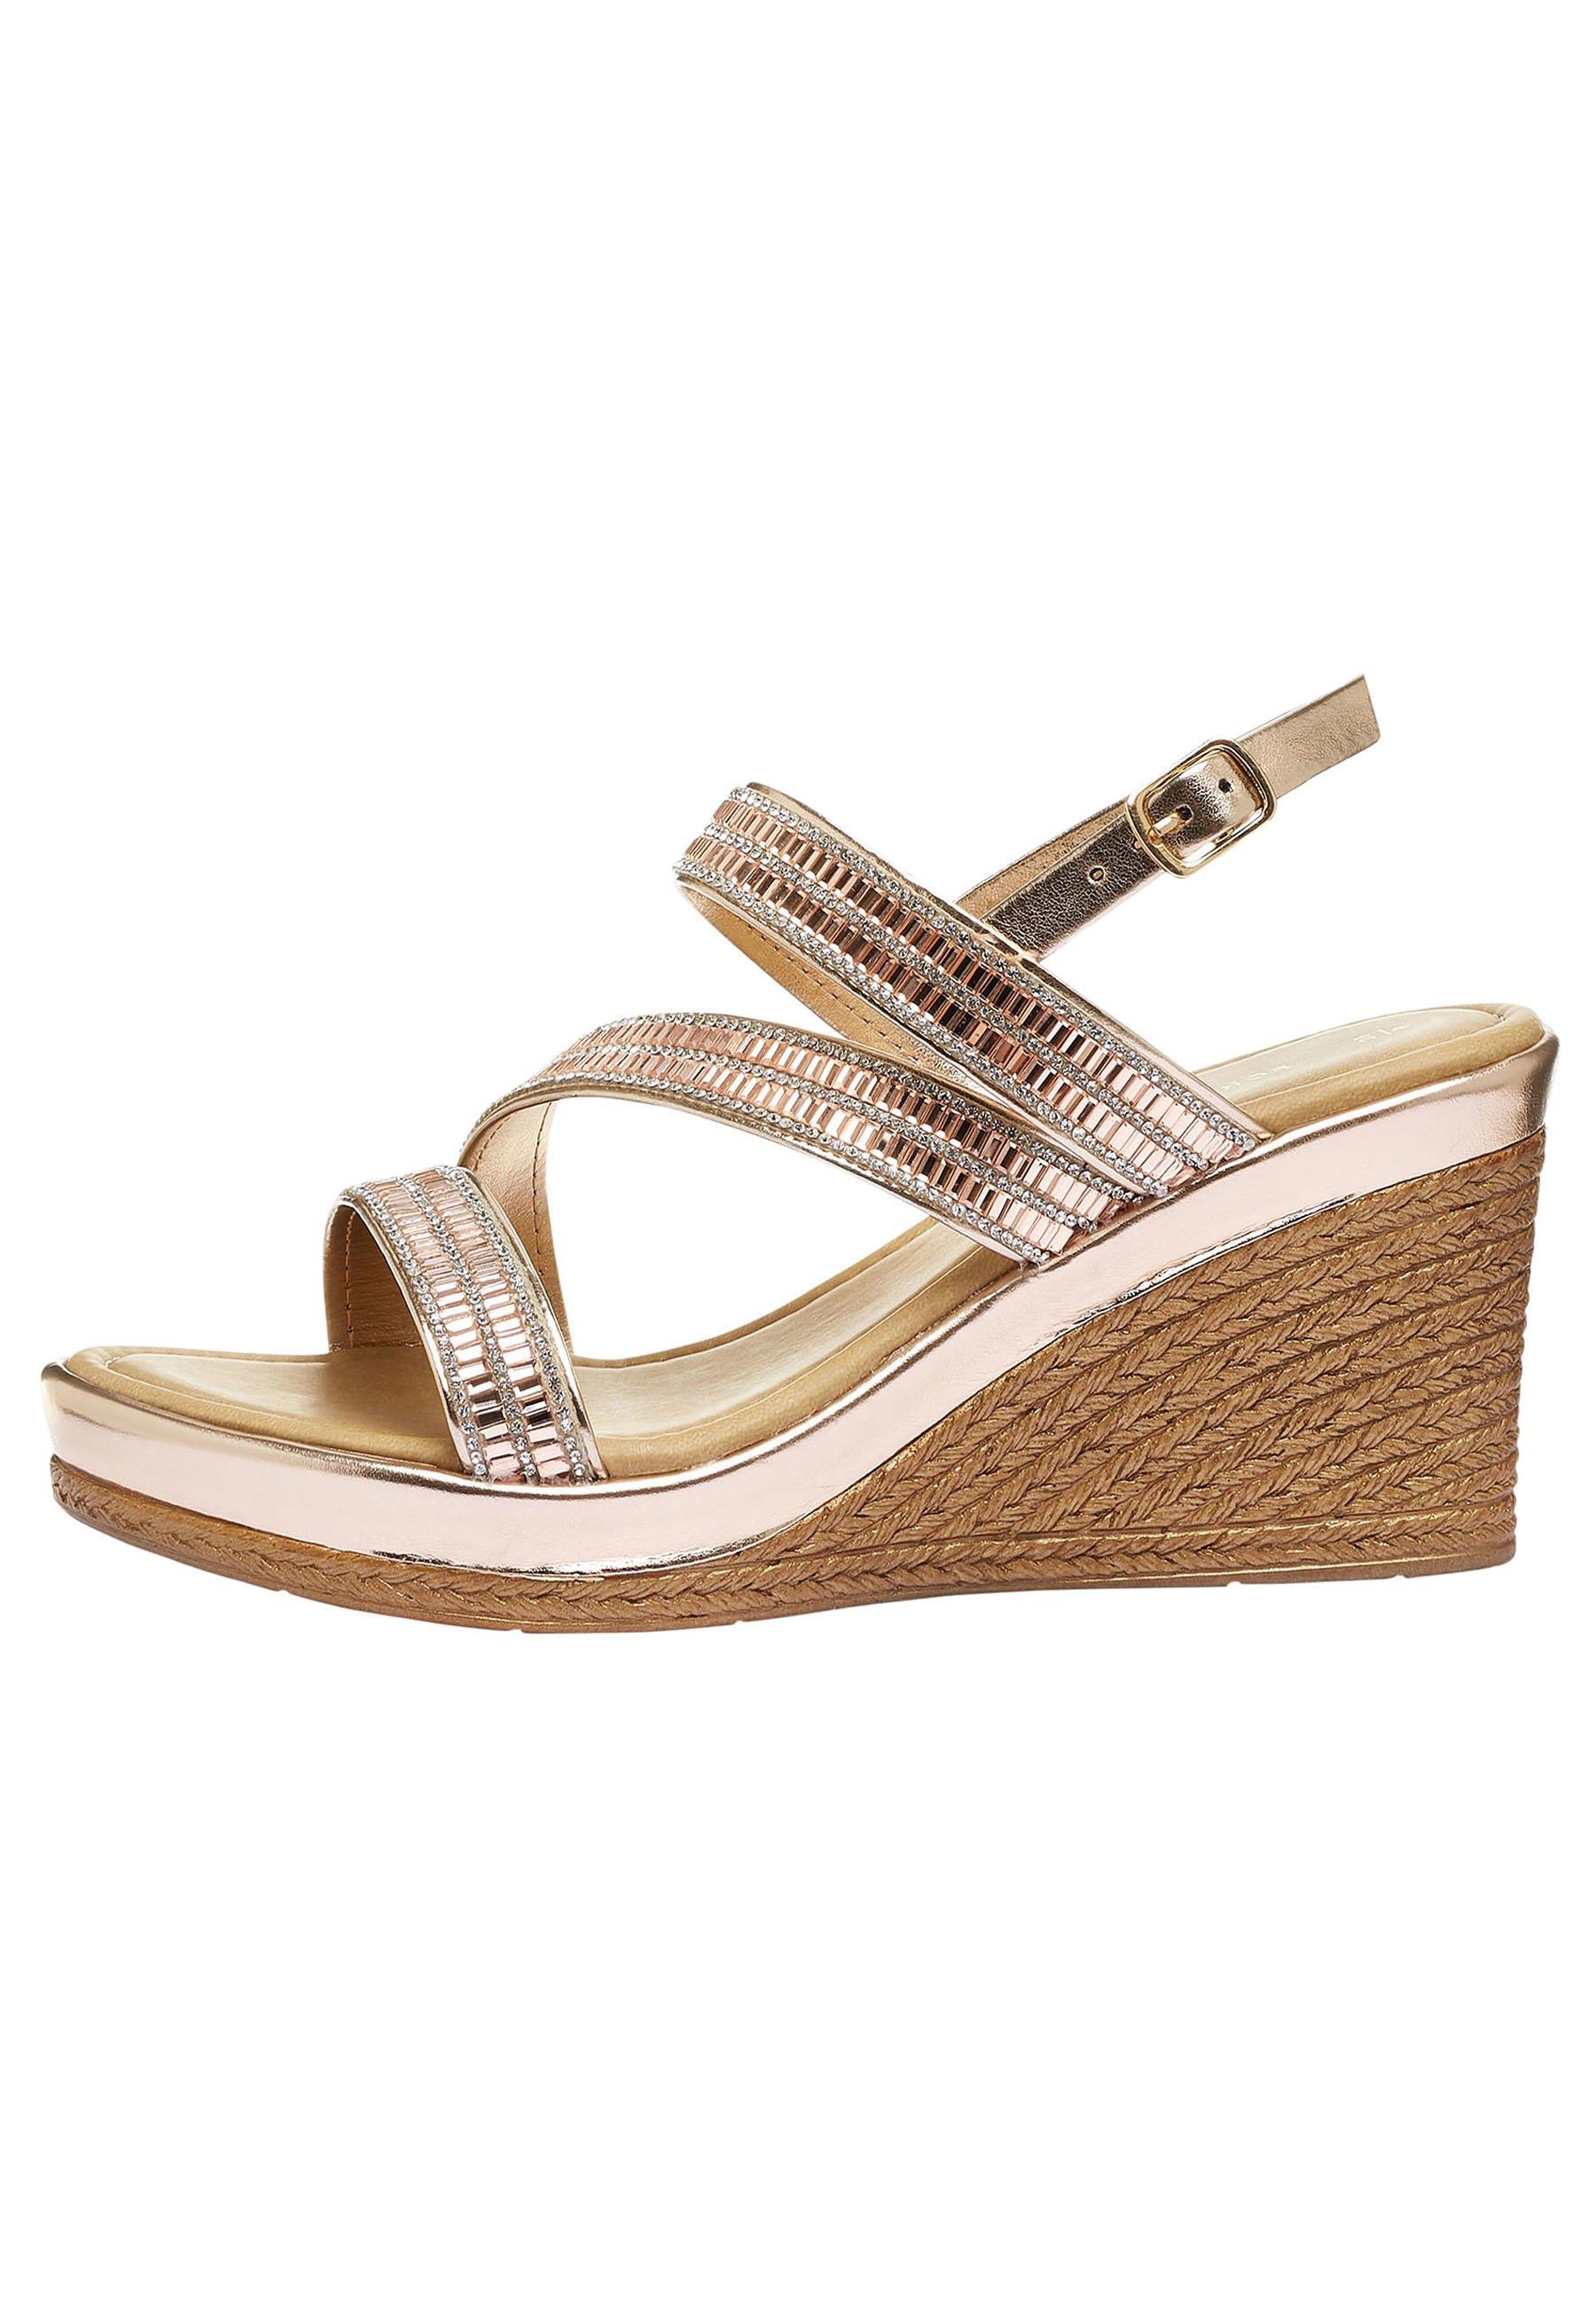 Damen SILVER ASYMMETRIC SPARKLY WEDGES - High Heel Sandalette